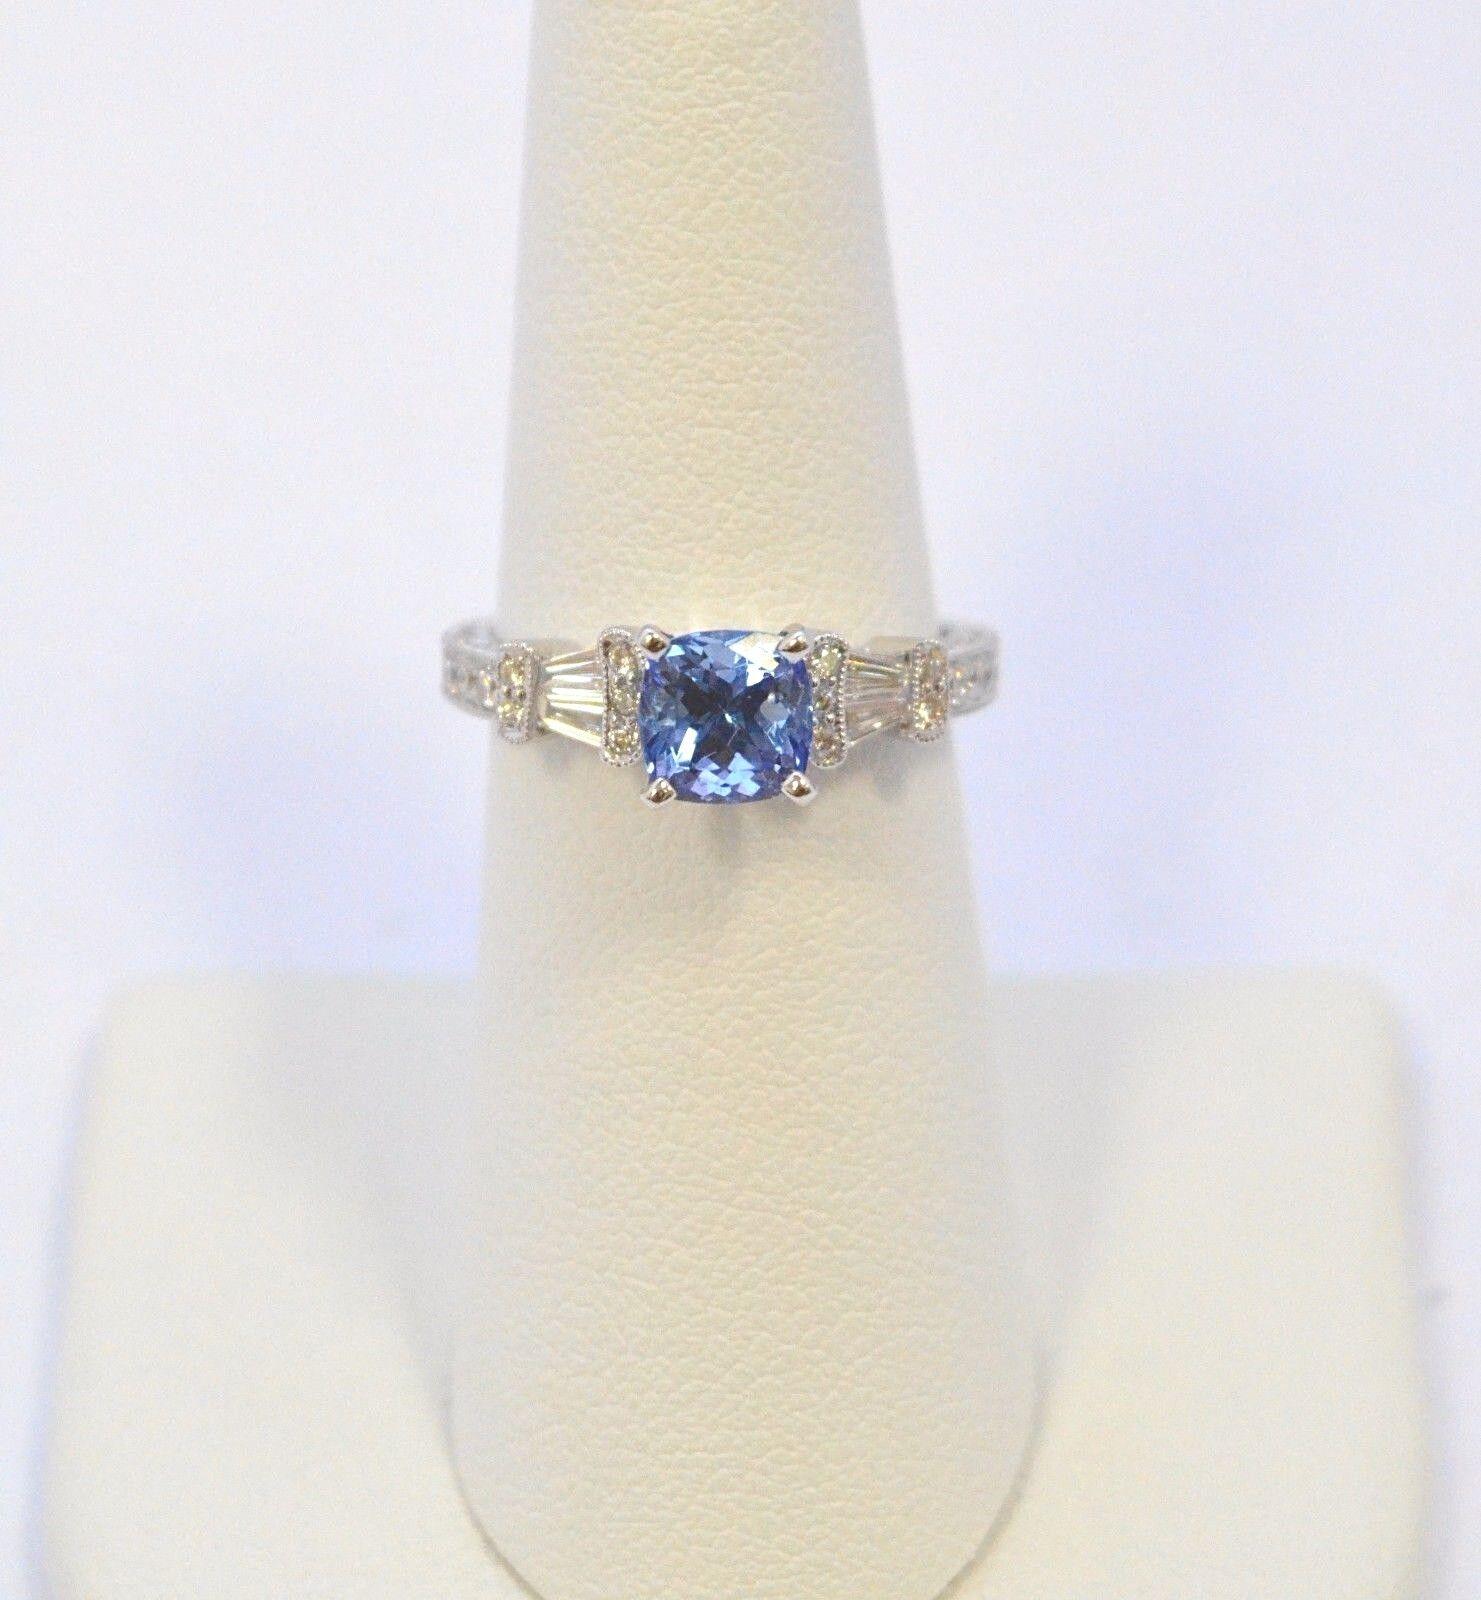 2987-18K WHITE gold TANZANITE & DIAMOND RING 2.02TCW 4.70 GRAMS SIZE 6.5